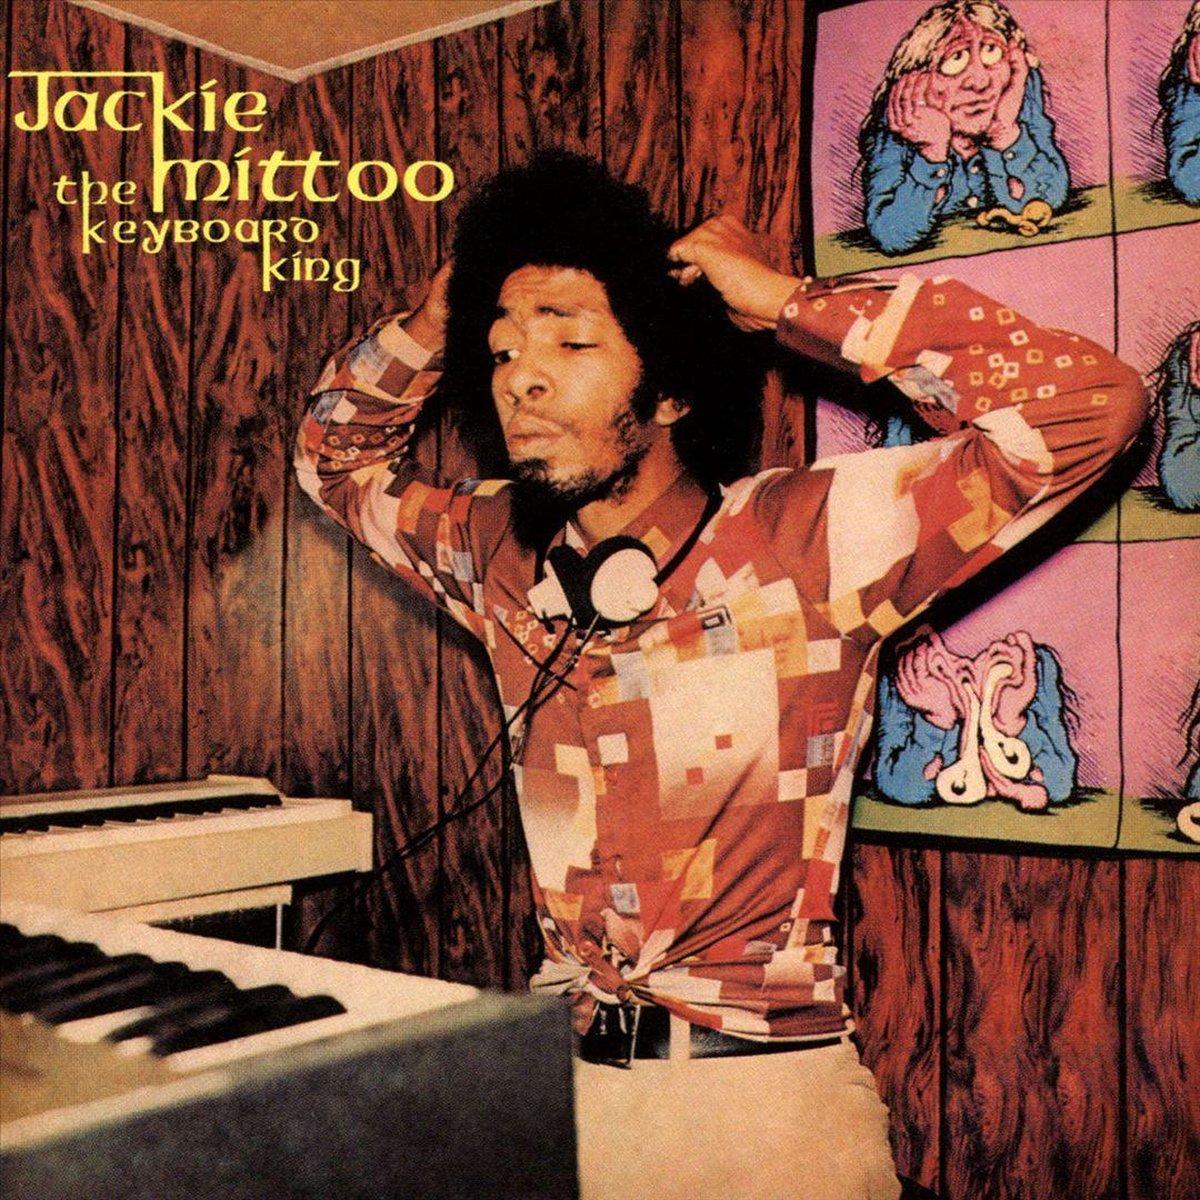 The Keyboard King - Jackie Mittoo